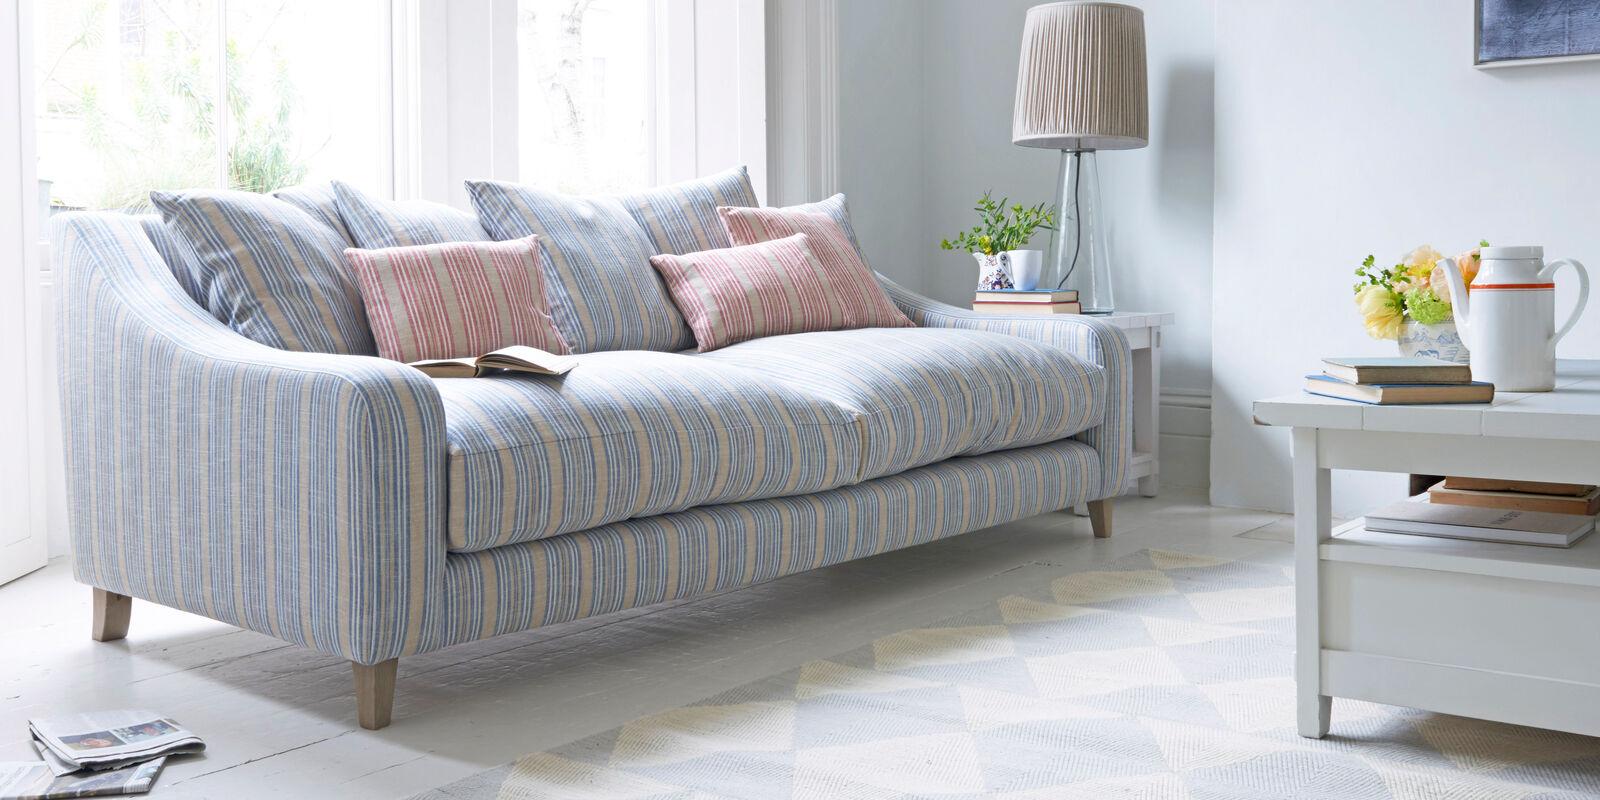 Oscar deep sofa in striped fabric